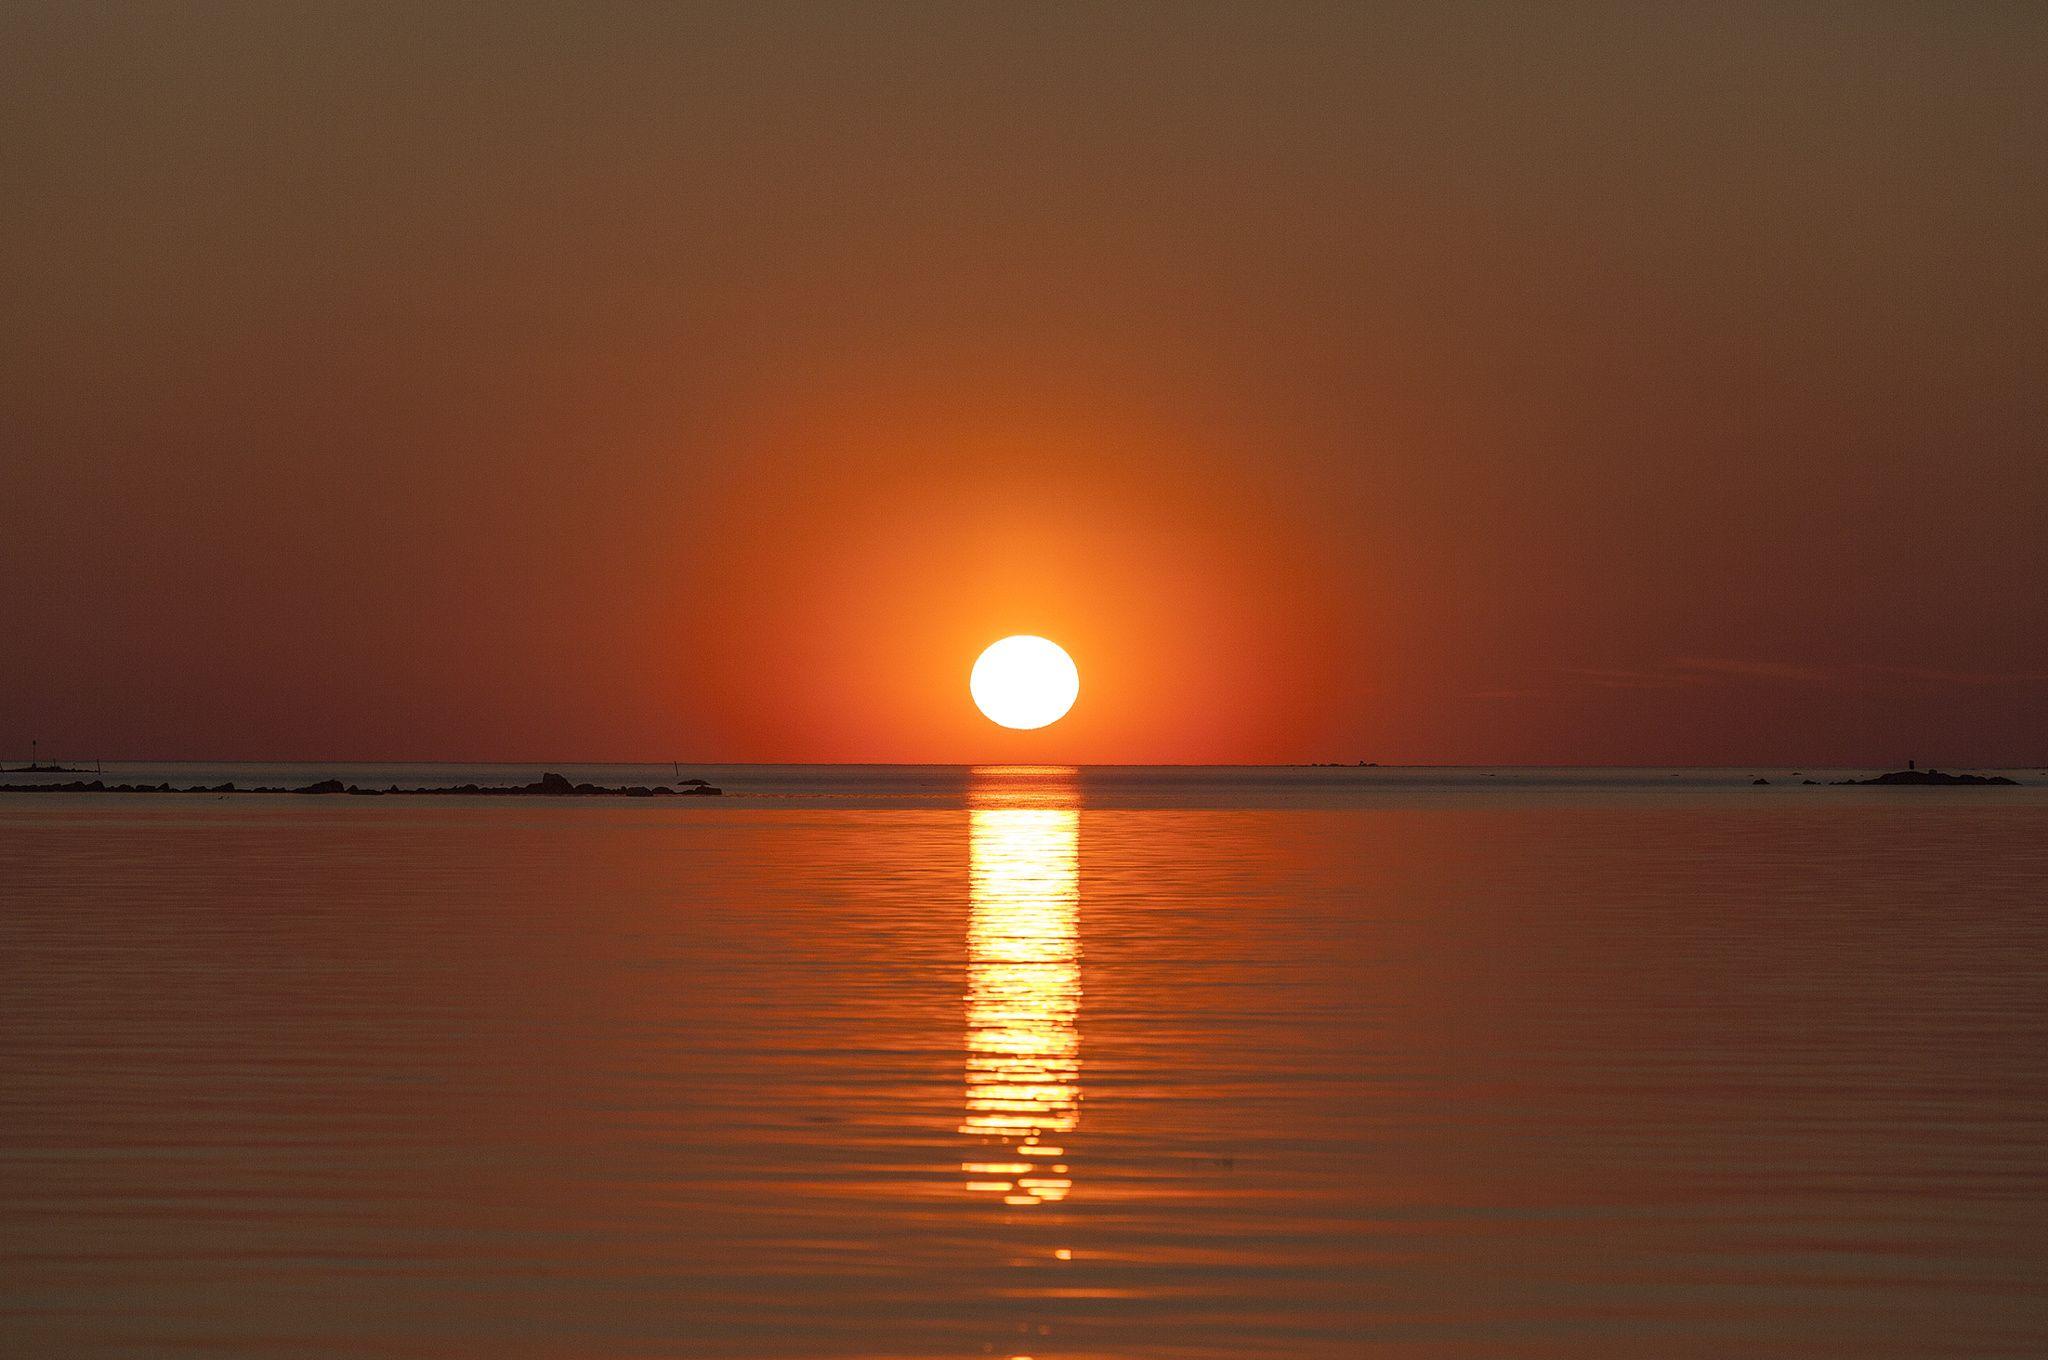 sundown ©Mainostoimisto Precis/Tapio Aulu